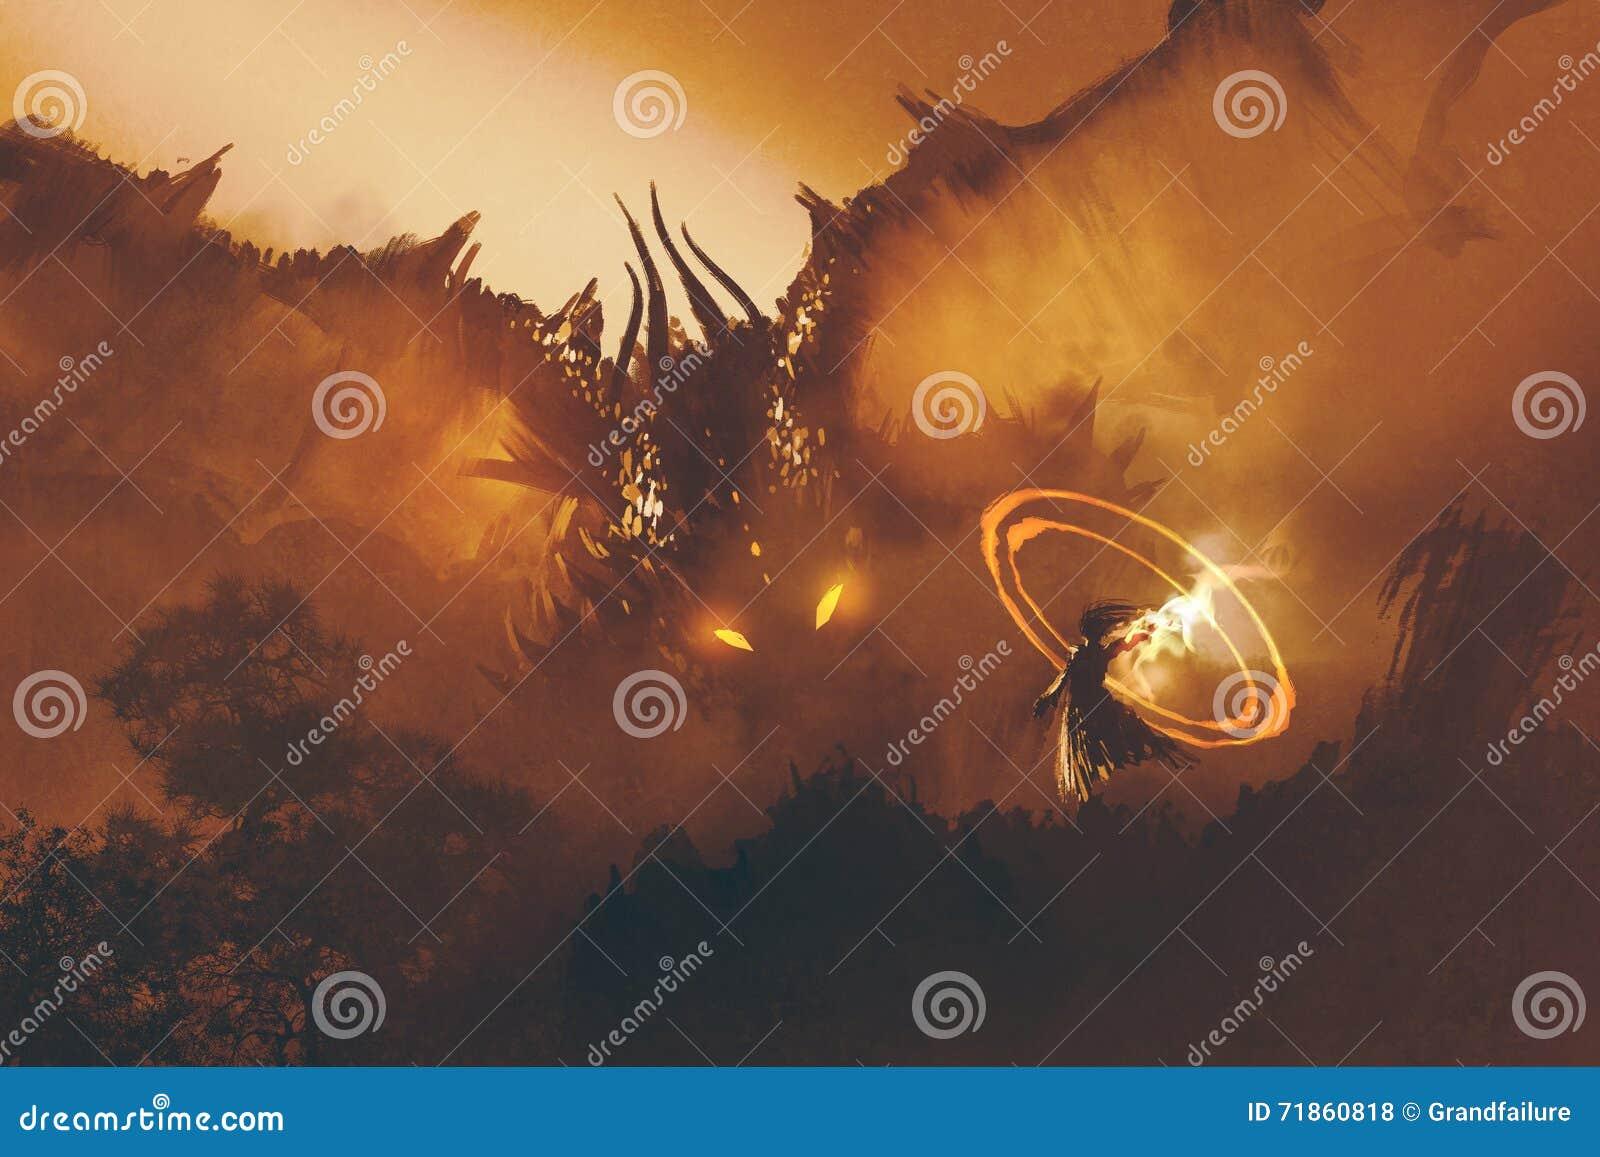 Llamada del dragón, pintura digital